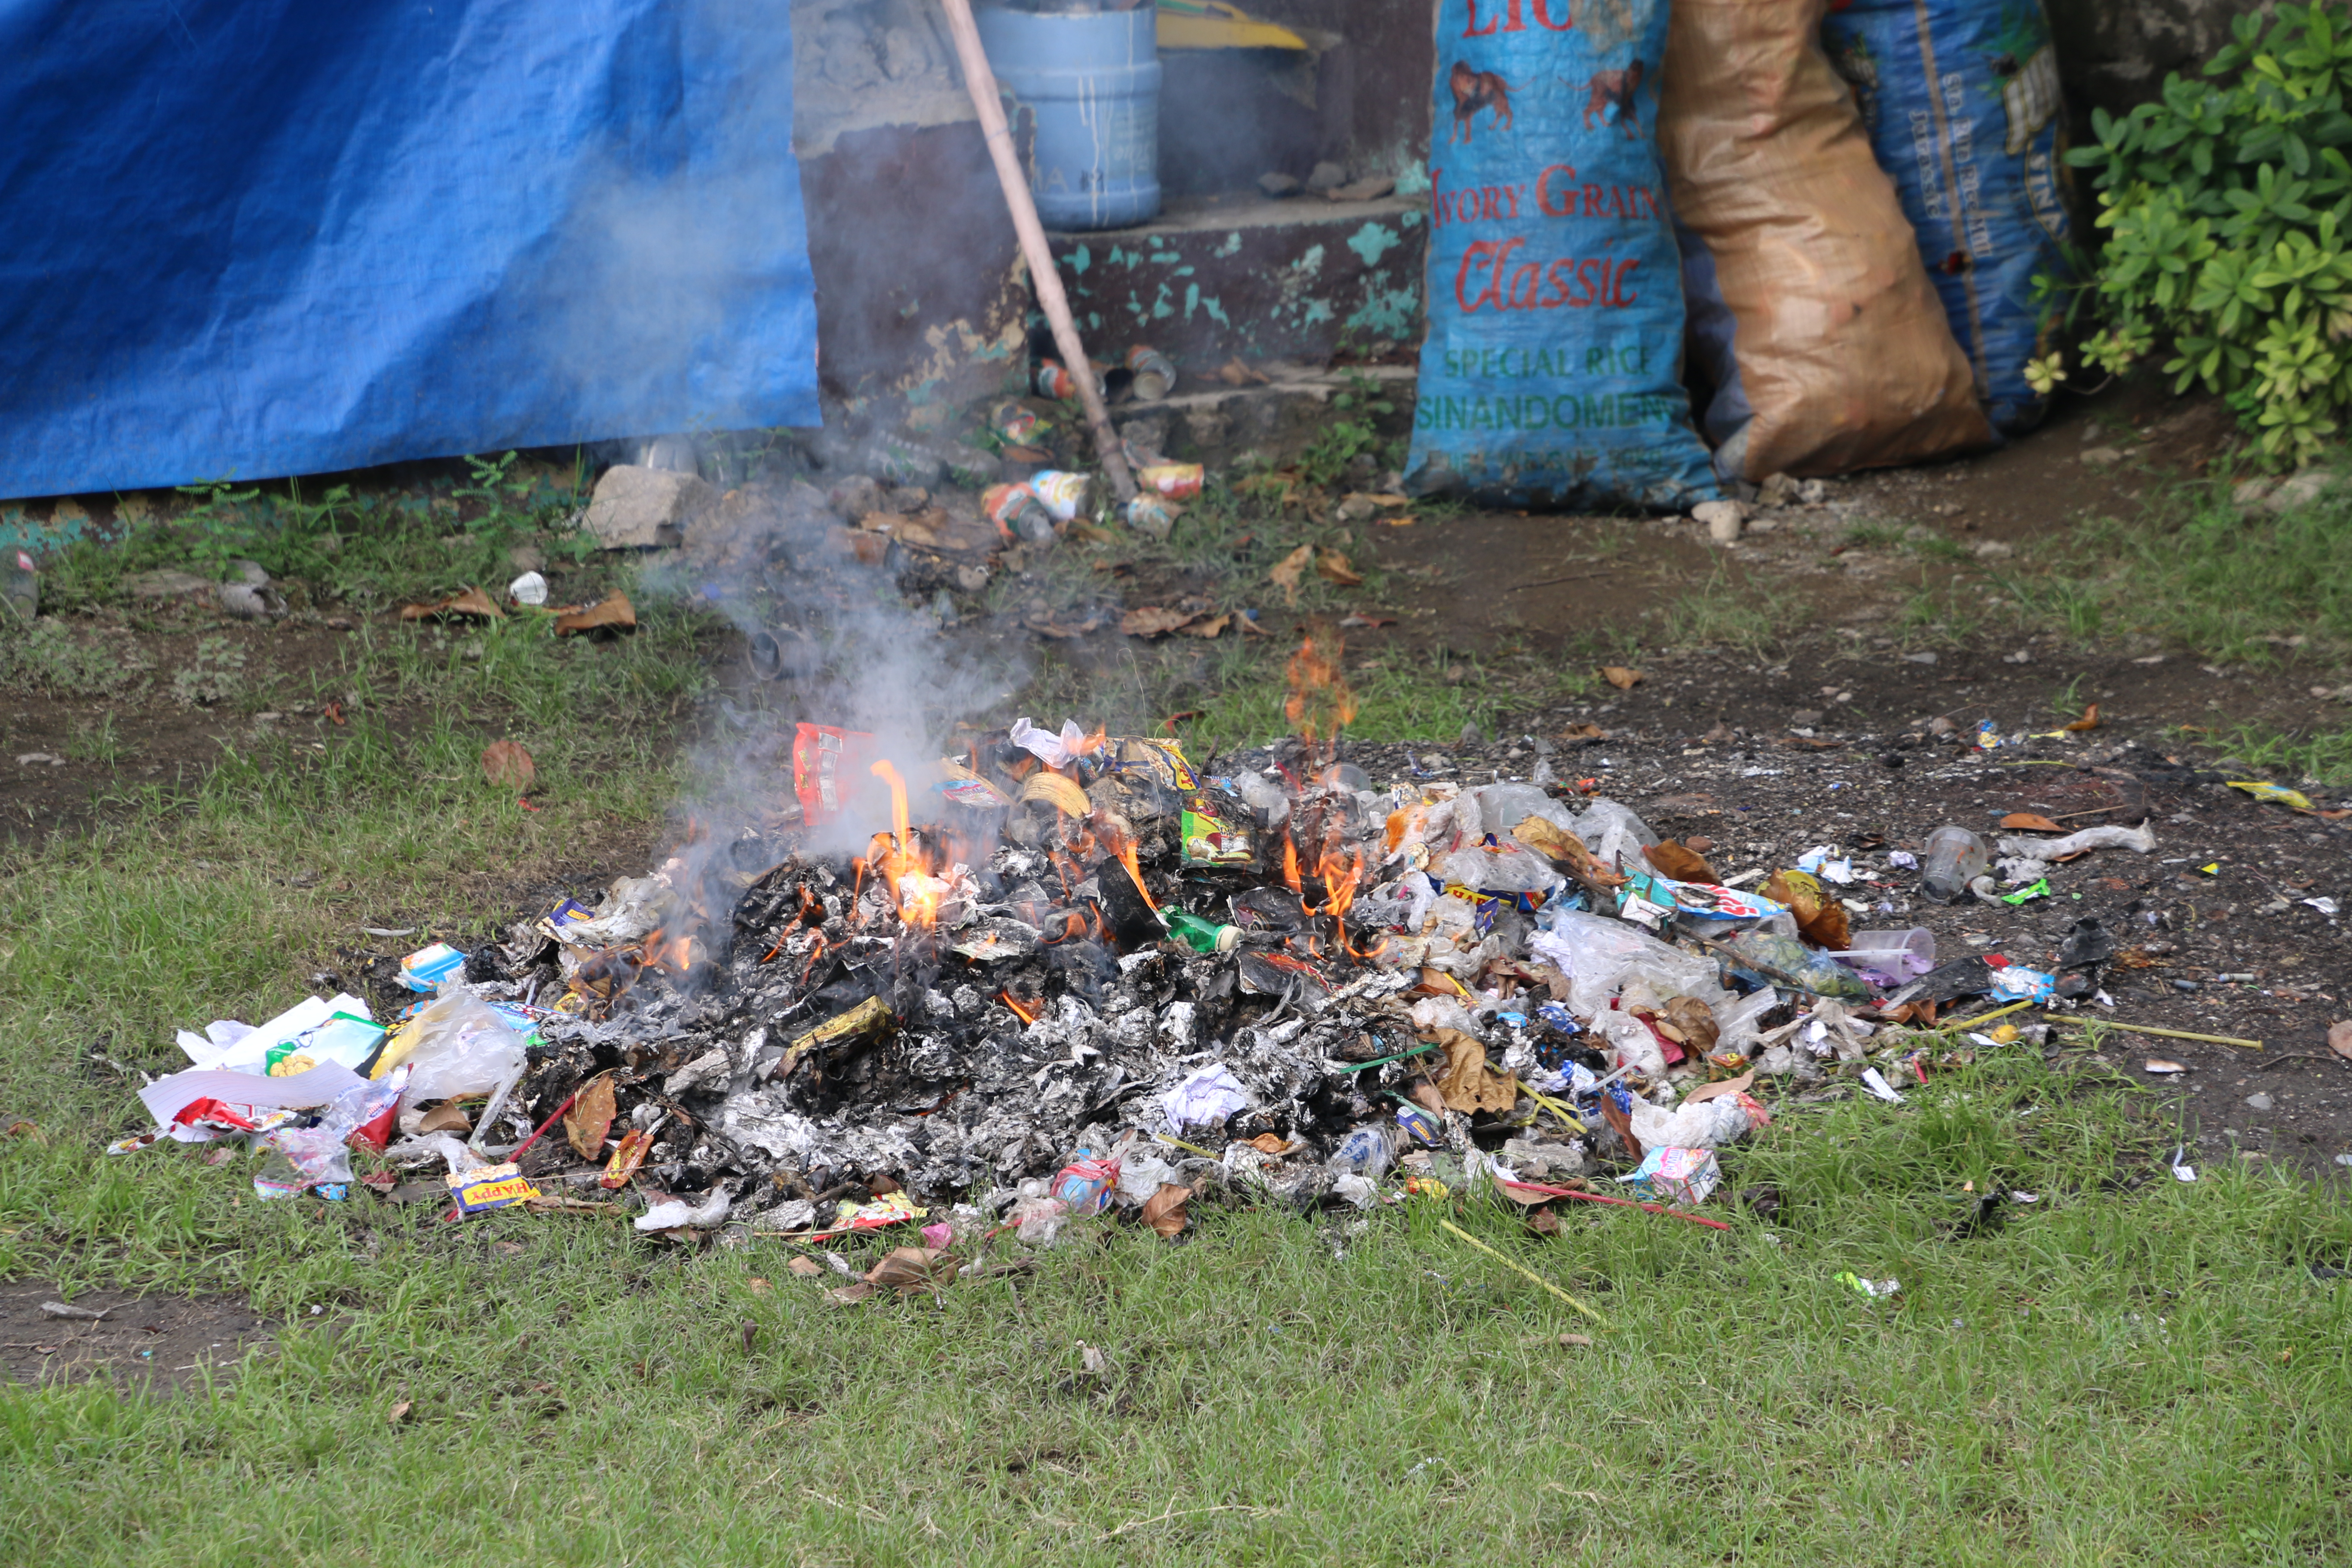 File:Burning garbage philippines w.jpg - Wikimedia Commons